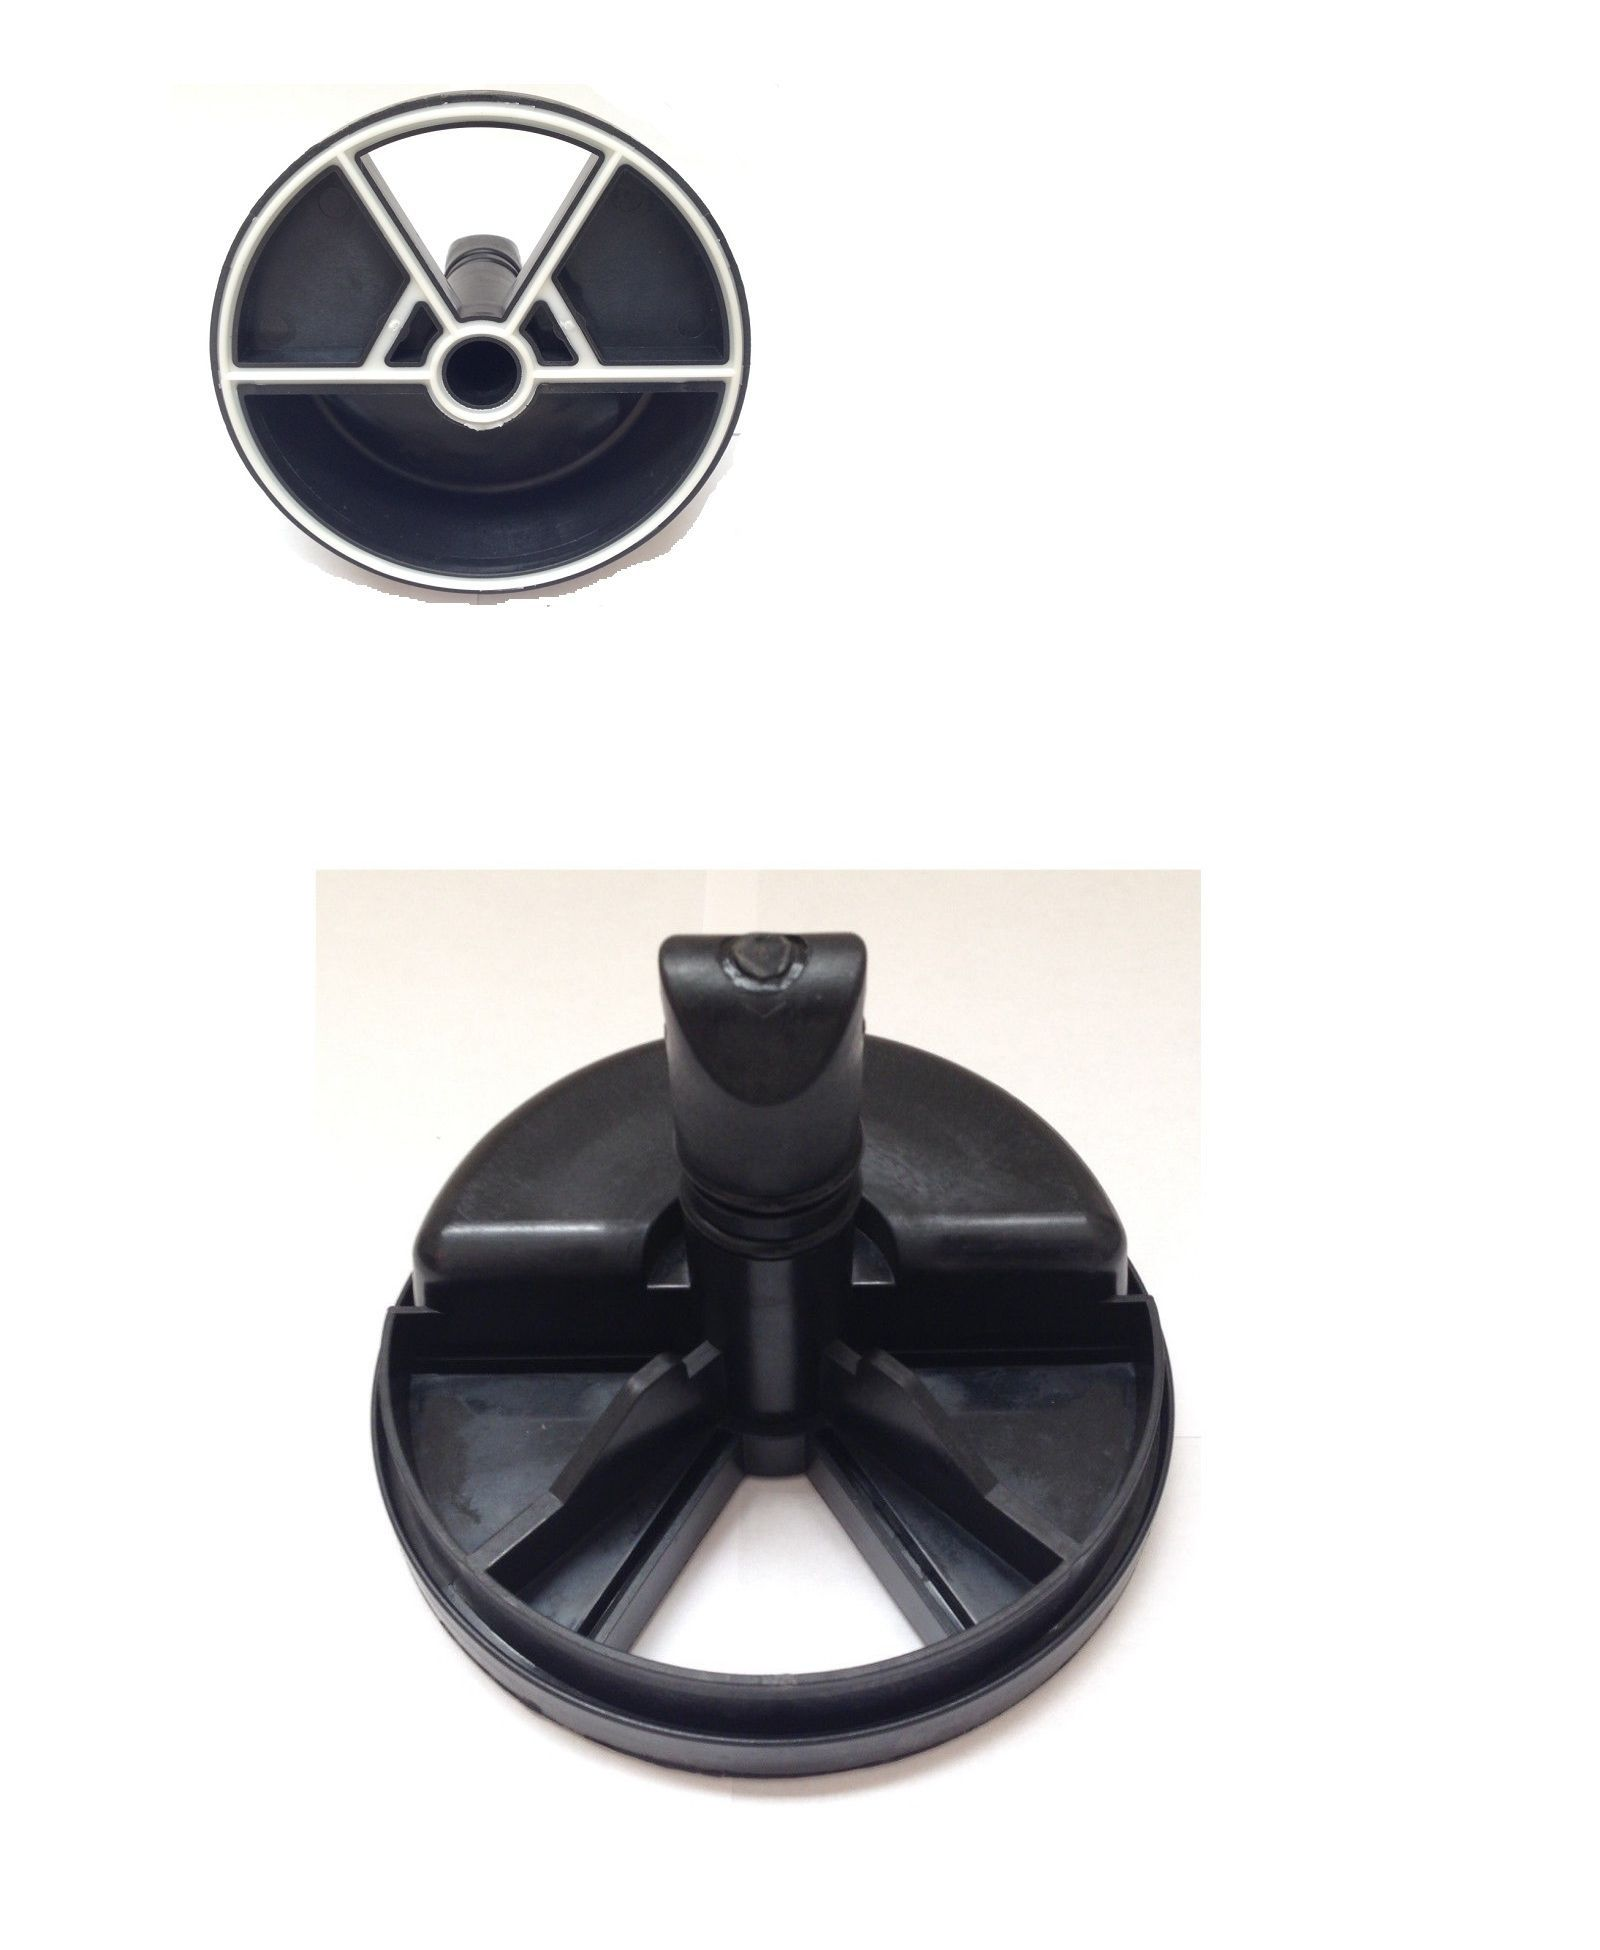 Details about multiport valve replacement variflo key